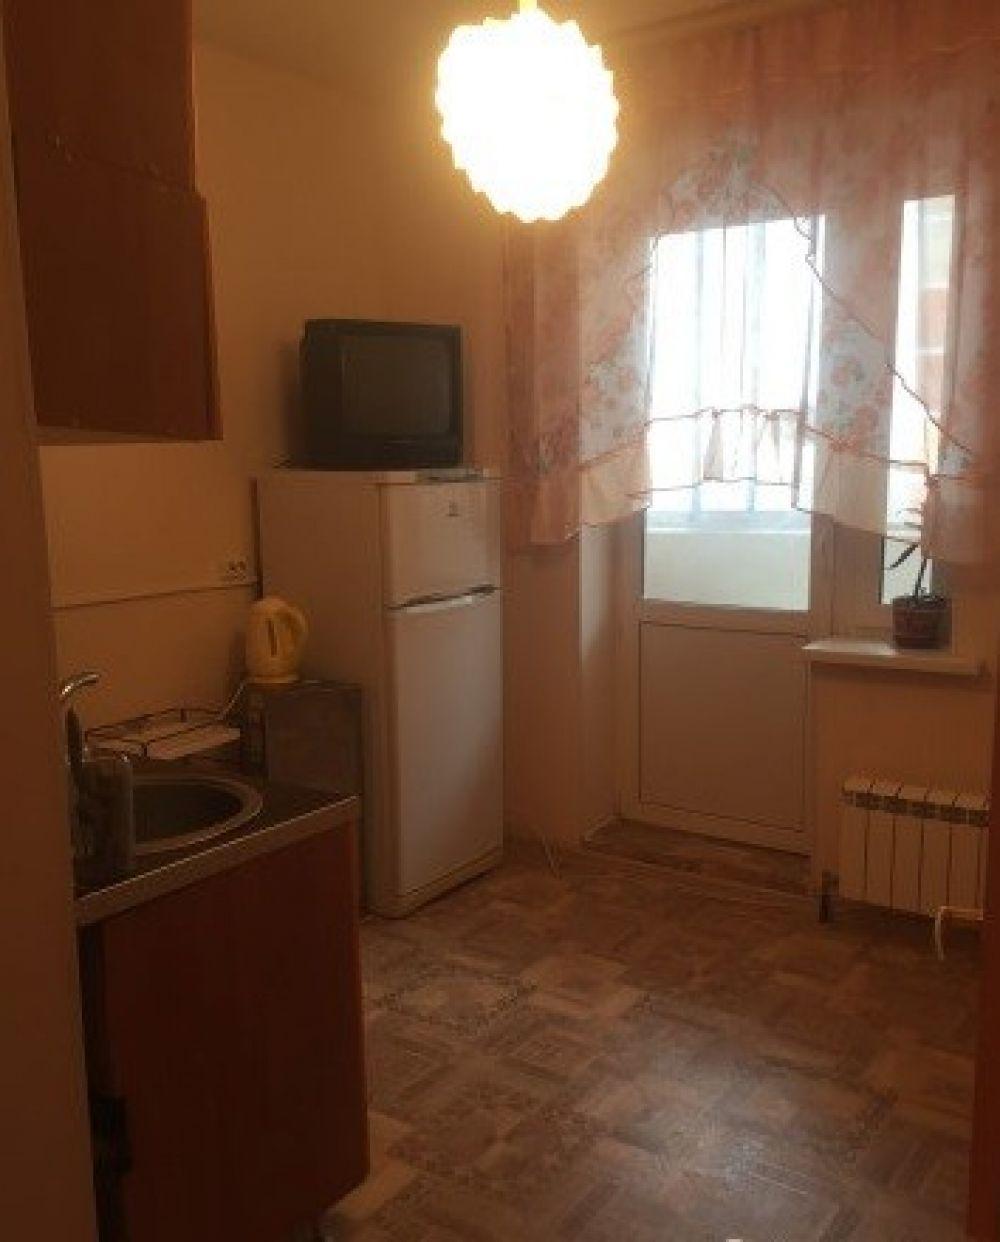 Однокомнатная квартира микрорайон  Богородский  д2 35 кв.м., фото 3